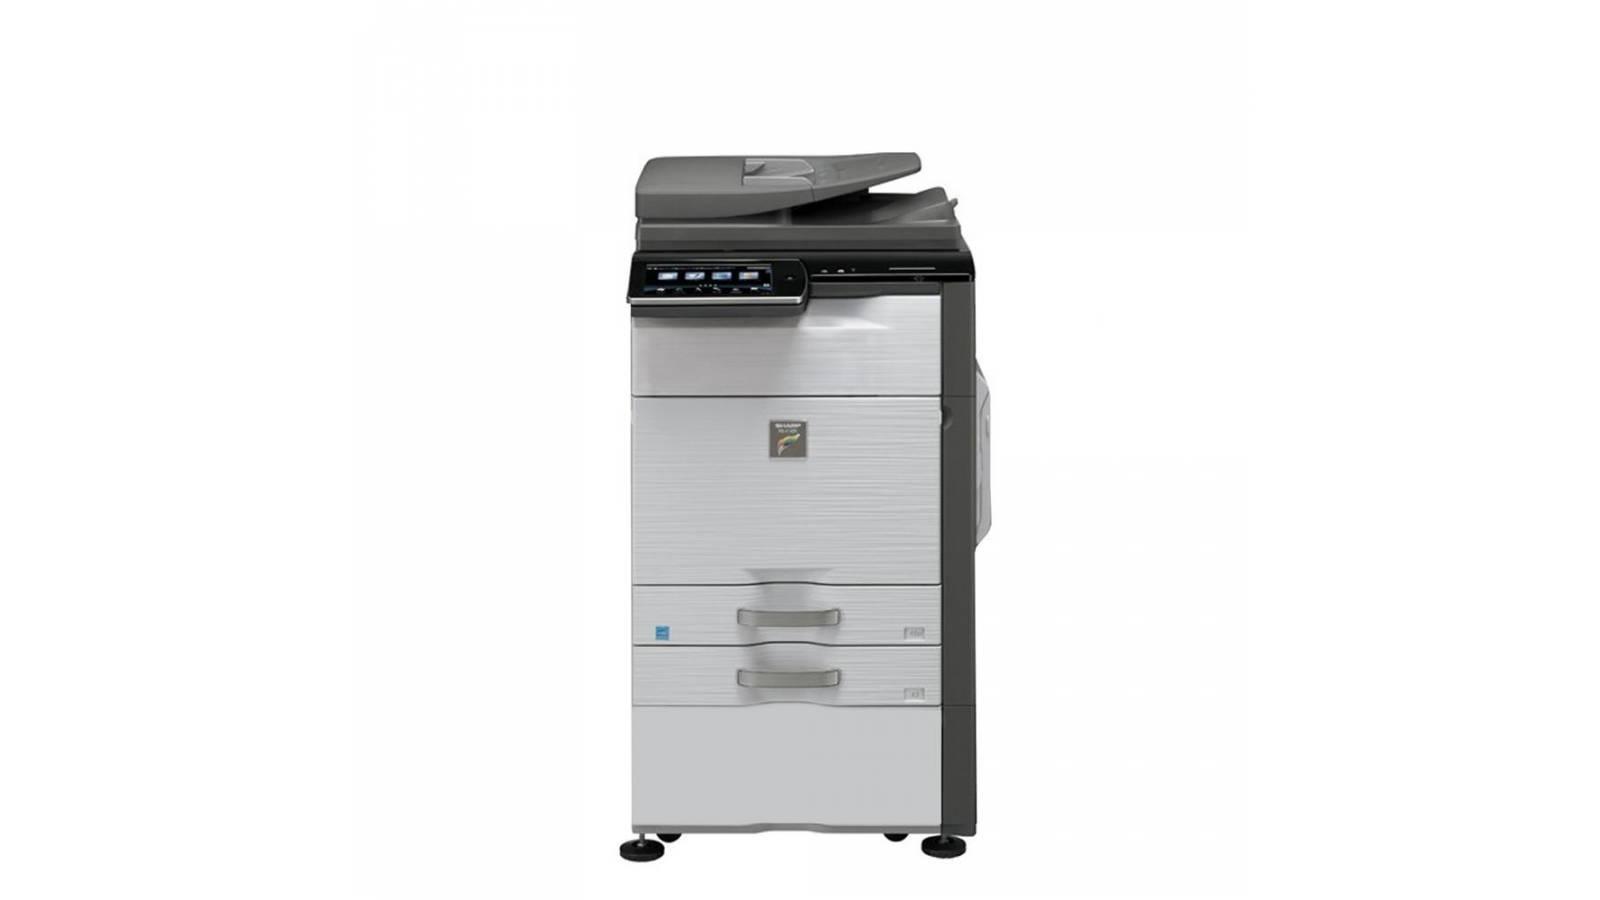 Multifuncional Sharp Láser Color A3 MX-5141N